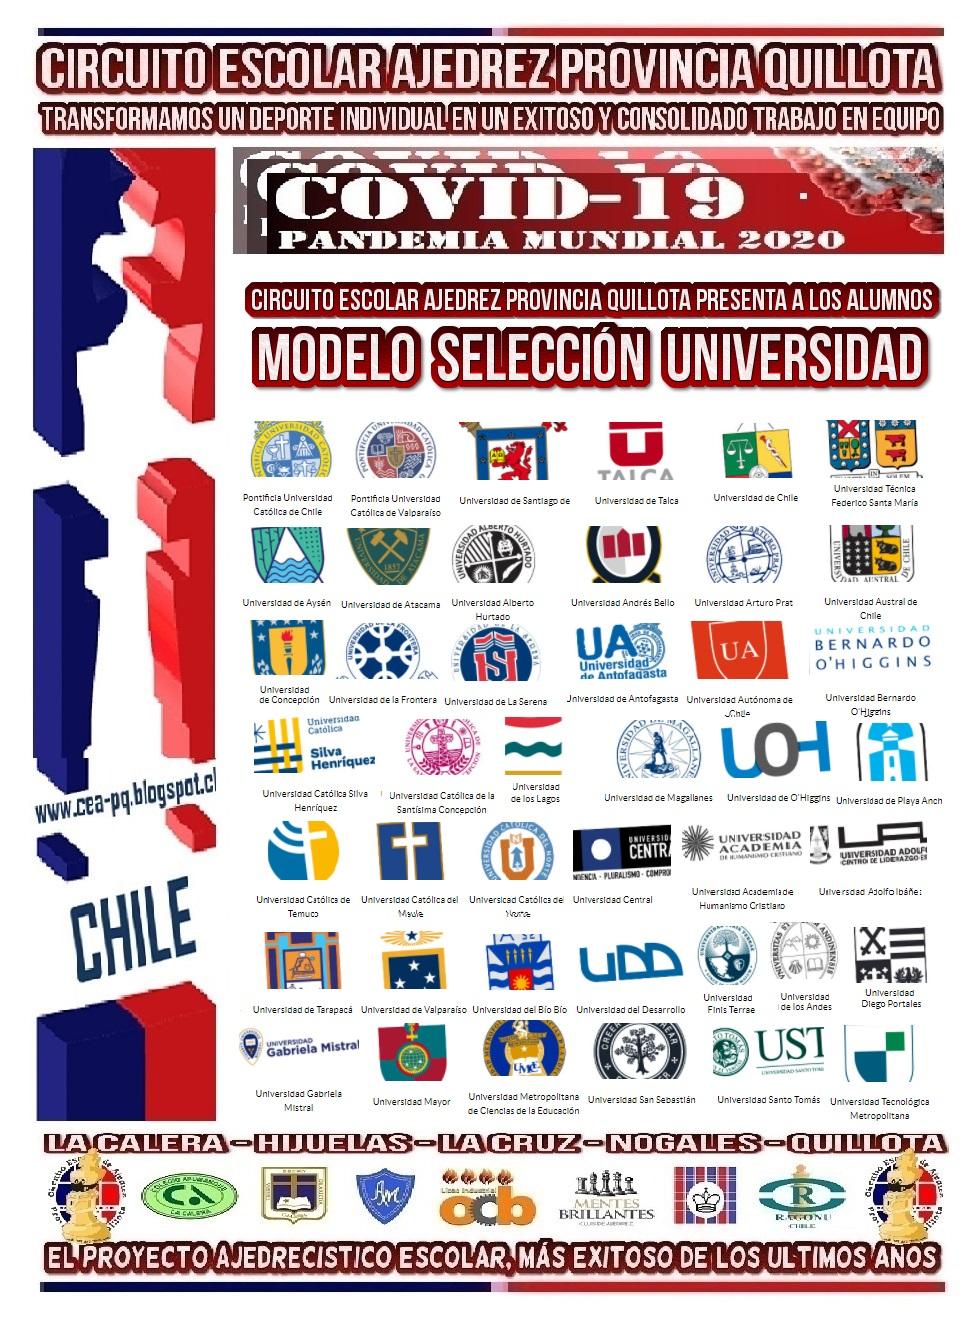 MODELO DE INGRESO A UNIVERSIDAD CIRCUITO ESCOLAR AJEDREZ PROVINCIA QUILLOTA .